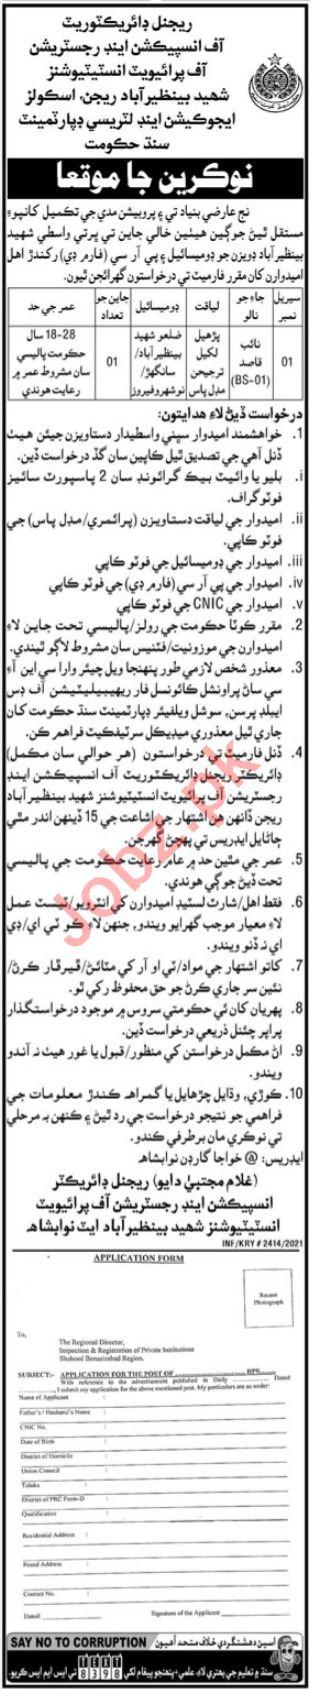 Regional Directorate of Inspection & Registration Jobs 2021